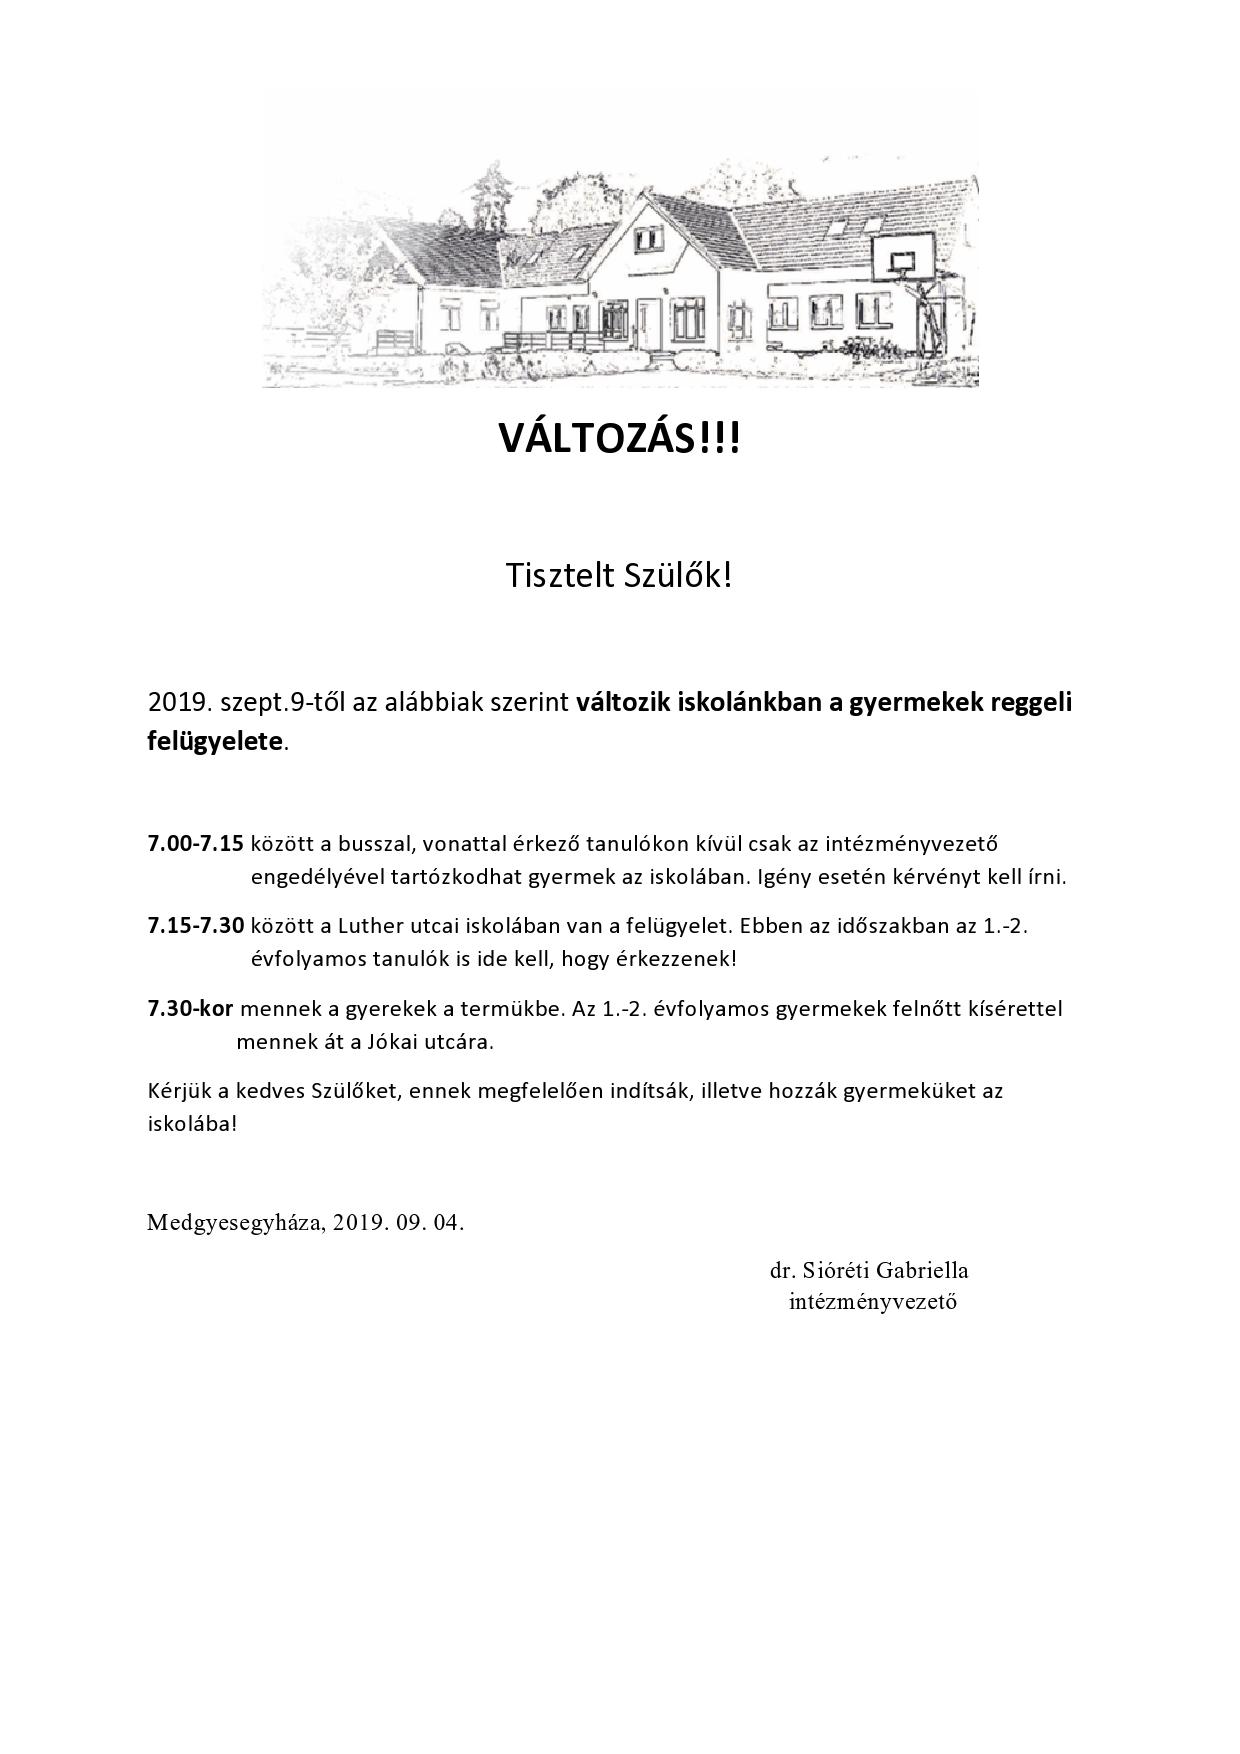 VÁLTOZÁS-page0001.jpg